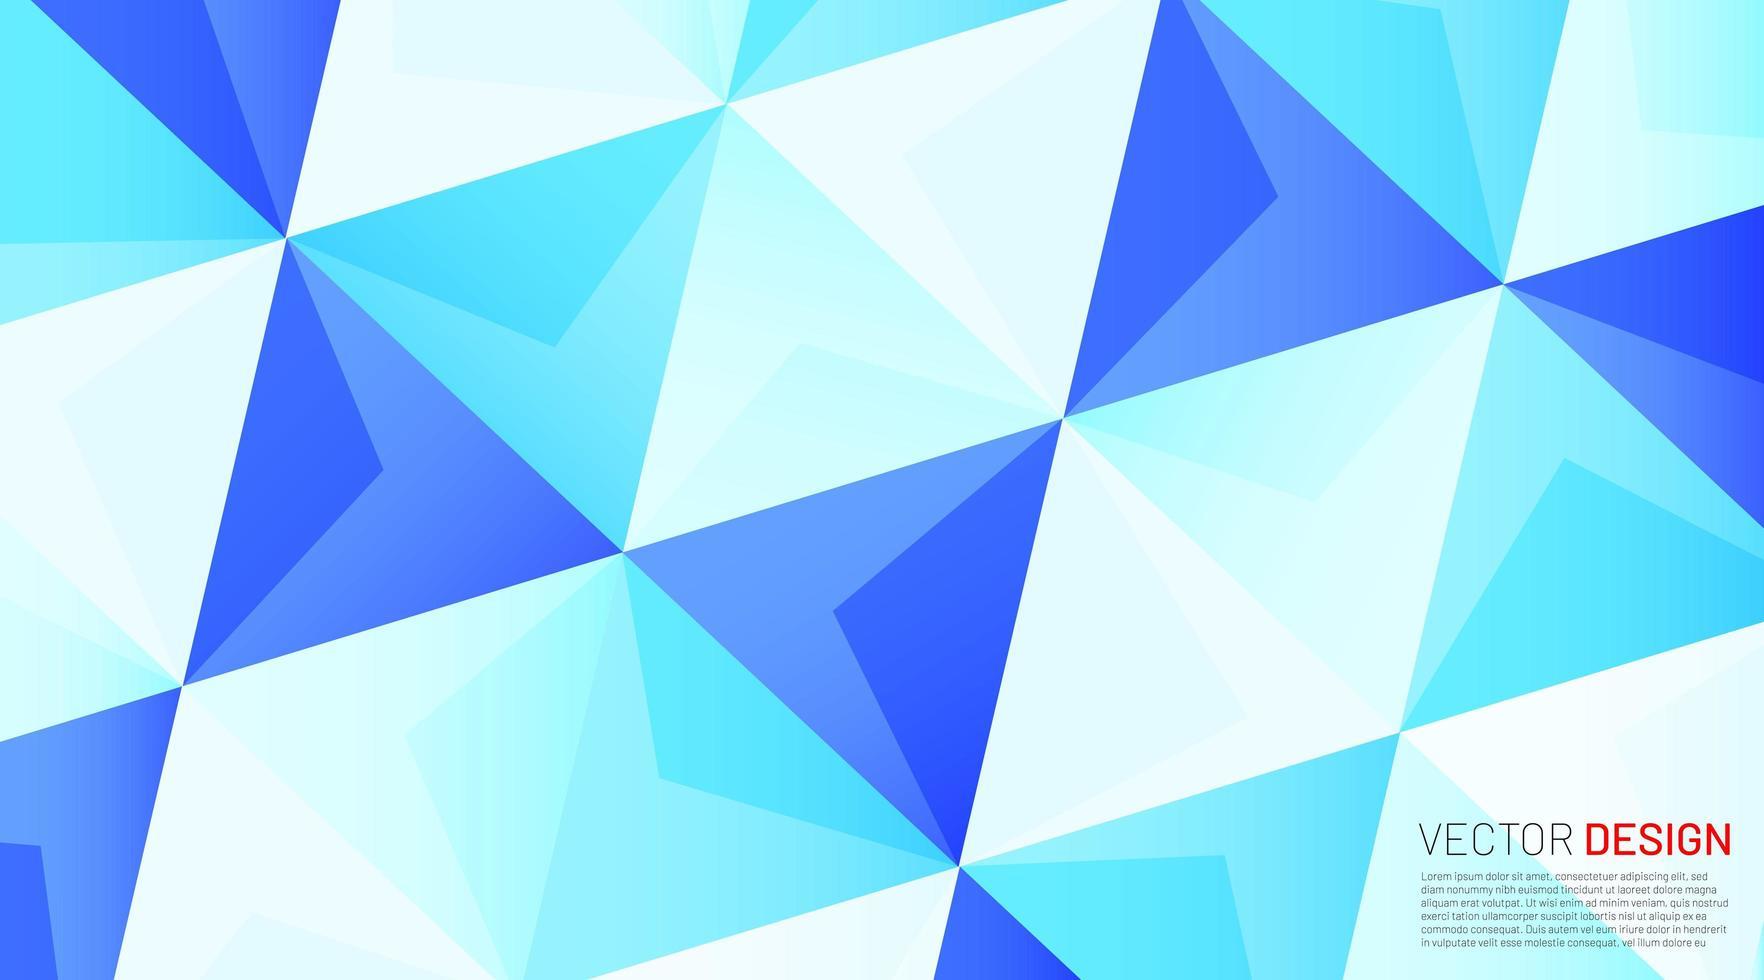 Fondo geométrico azul claro triangular vector